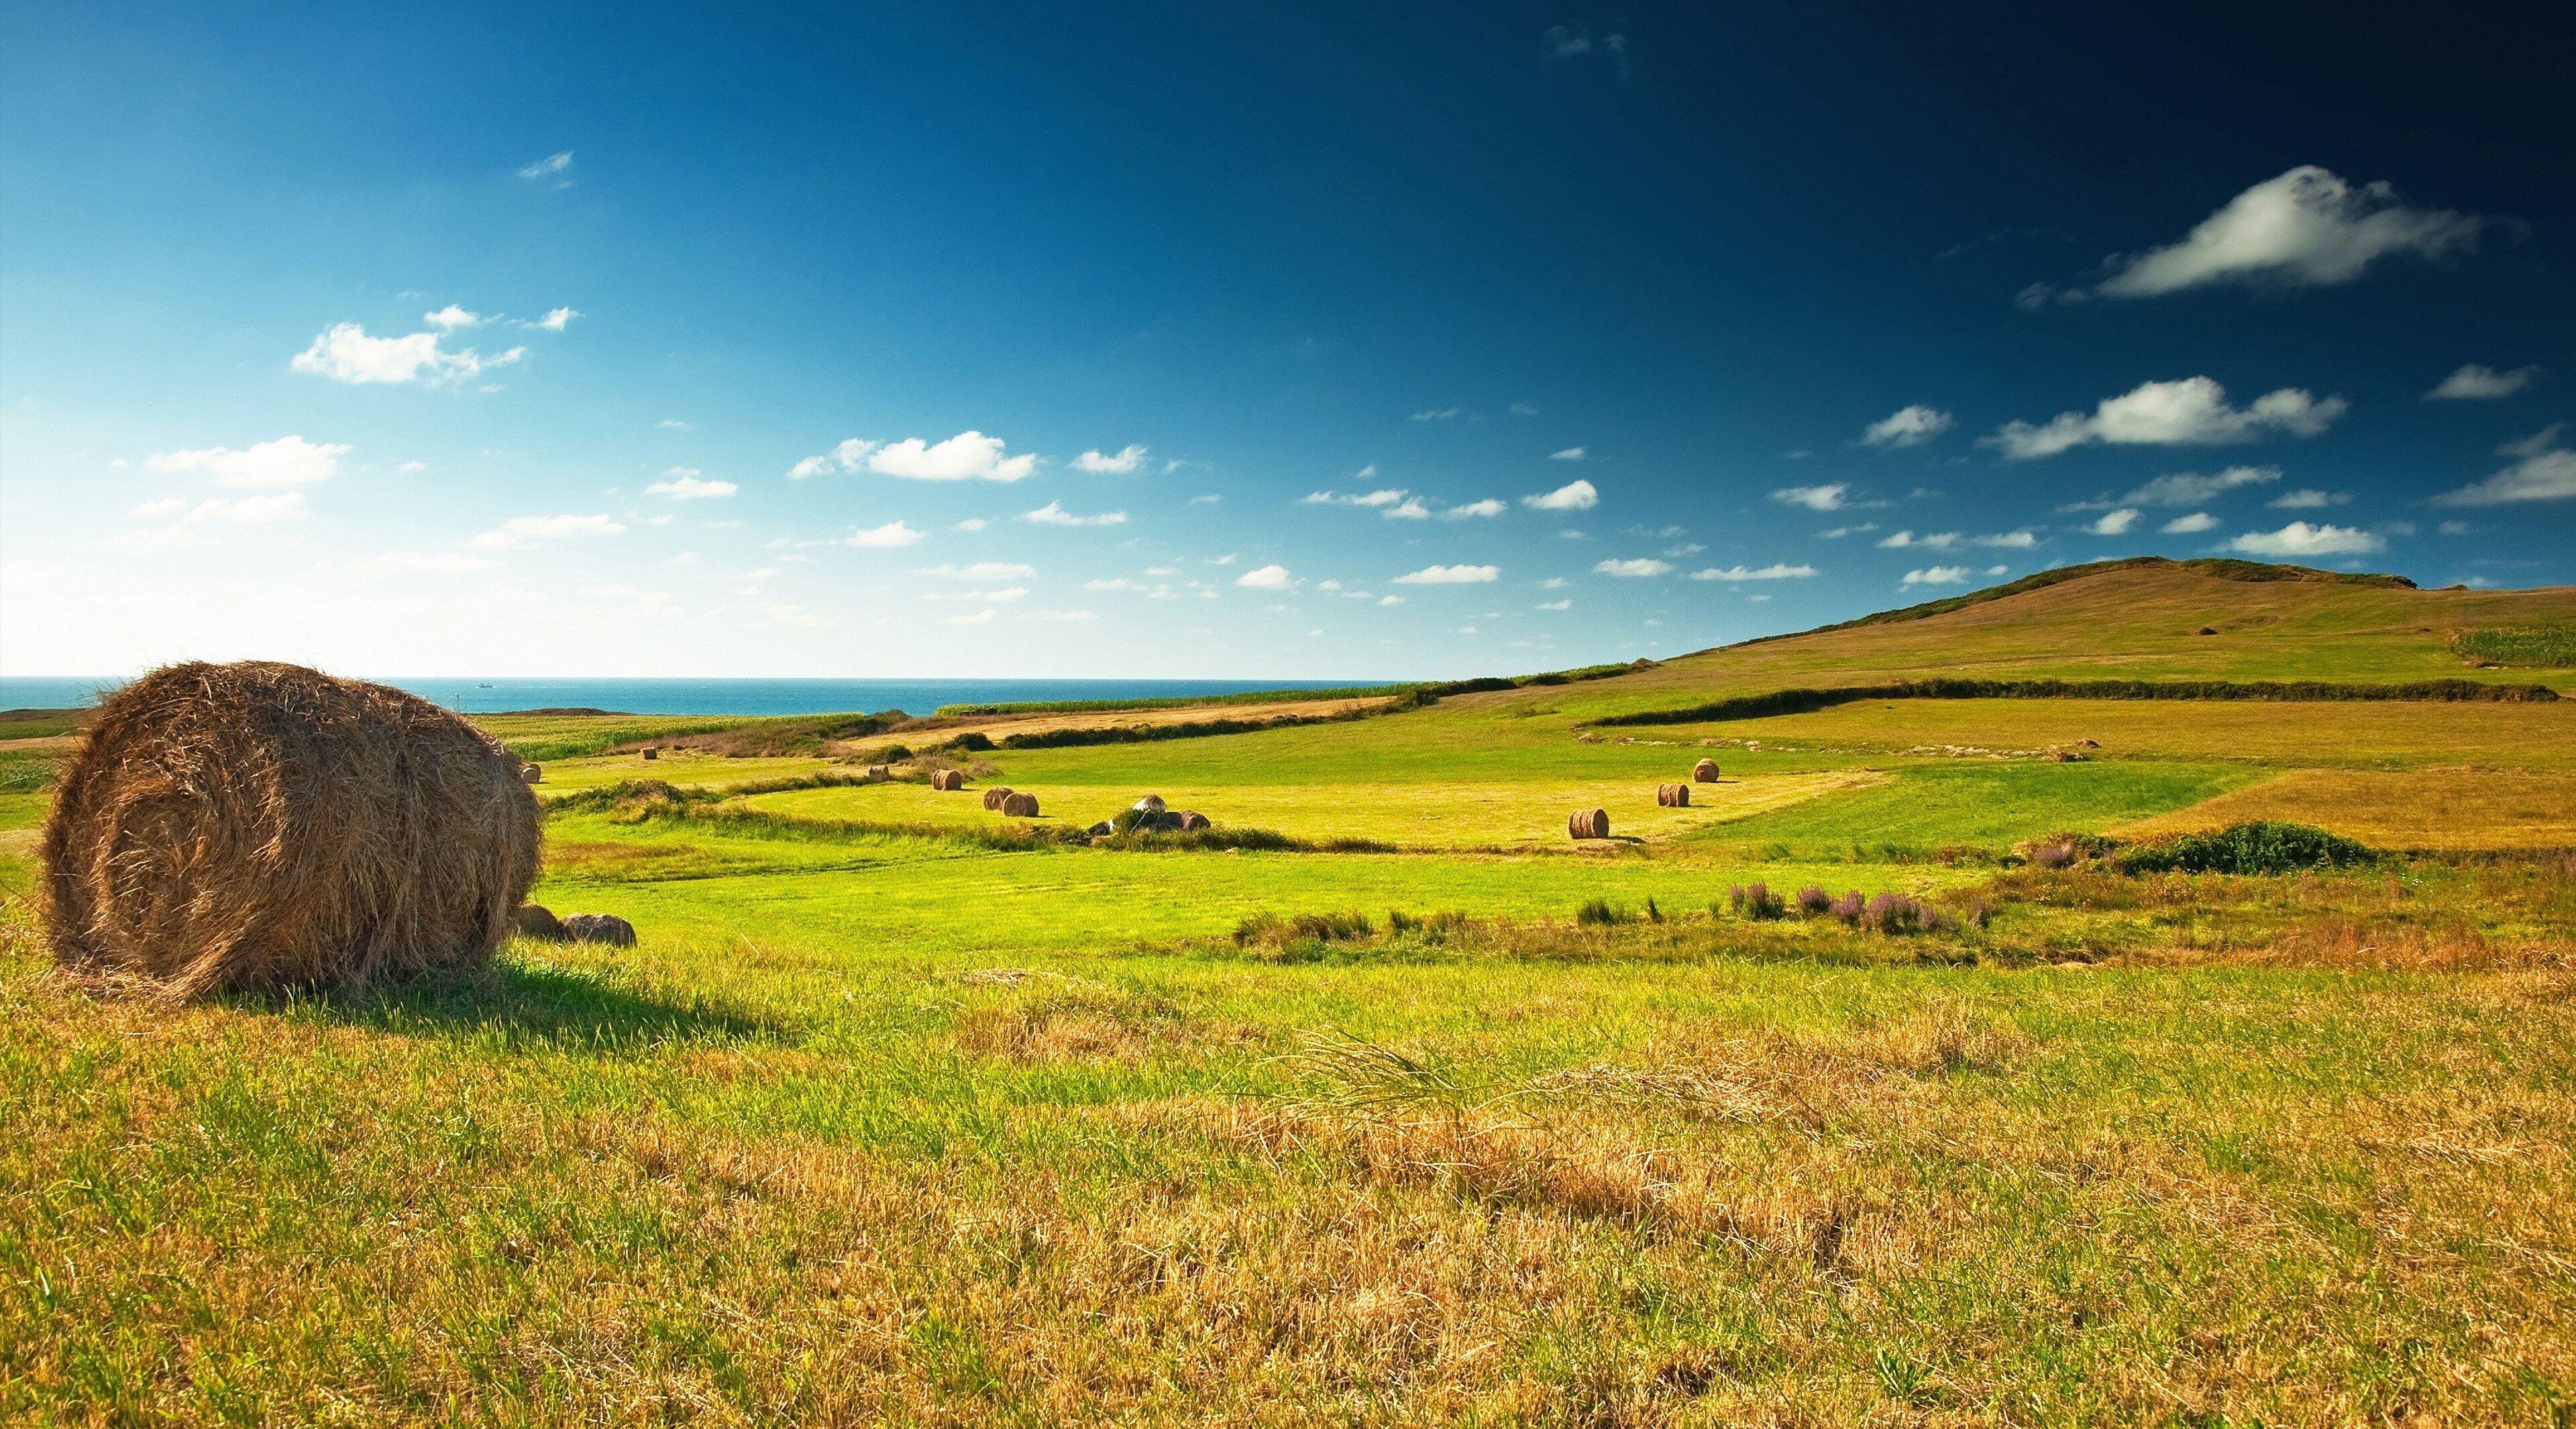 3840x2130 Meadows 4k Hd High Resolution Wallpaper Landscape Photography Landscape Digital Photography Backgrounds